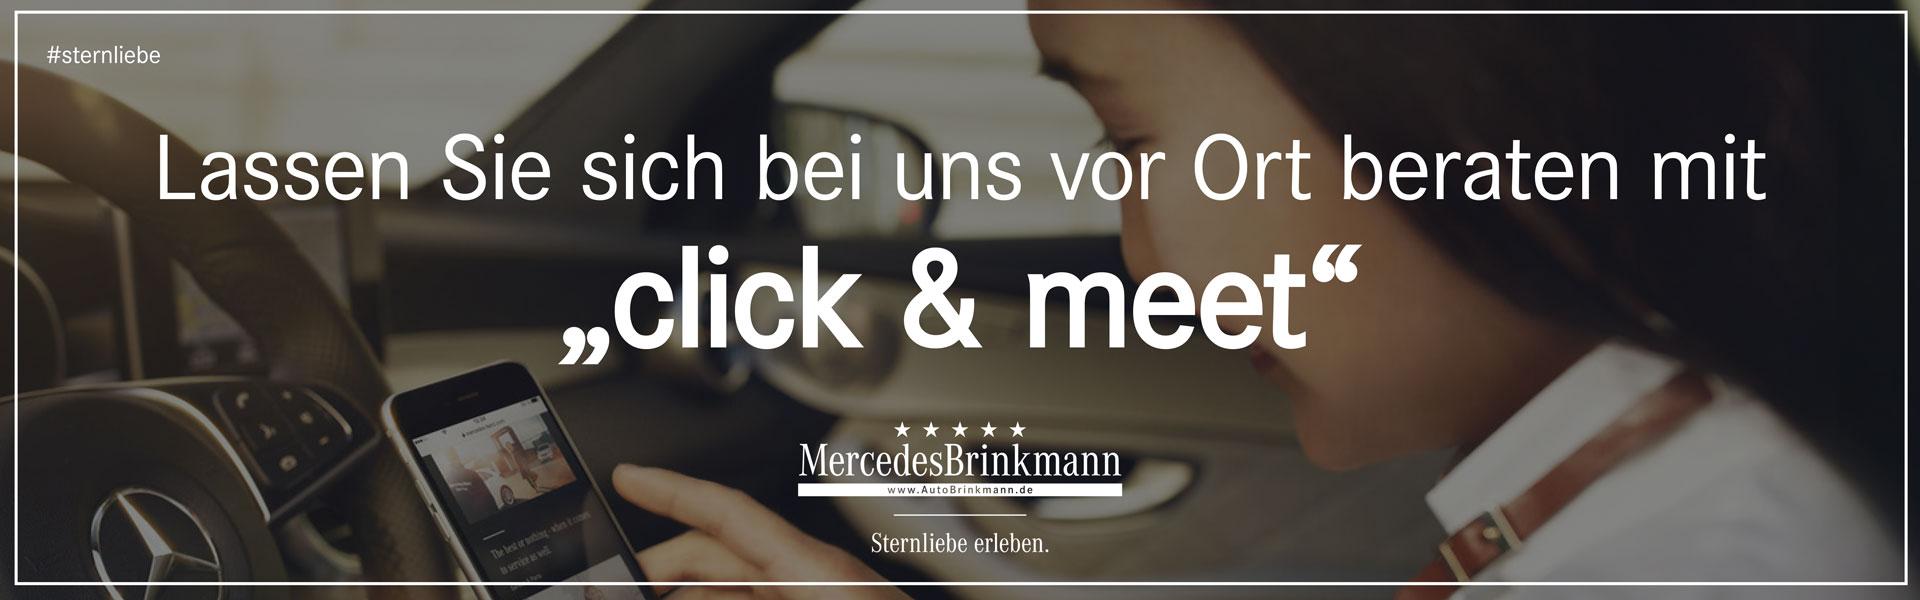 clickundmeet-Header_mercedes-benz-brinkmann